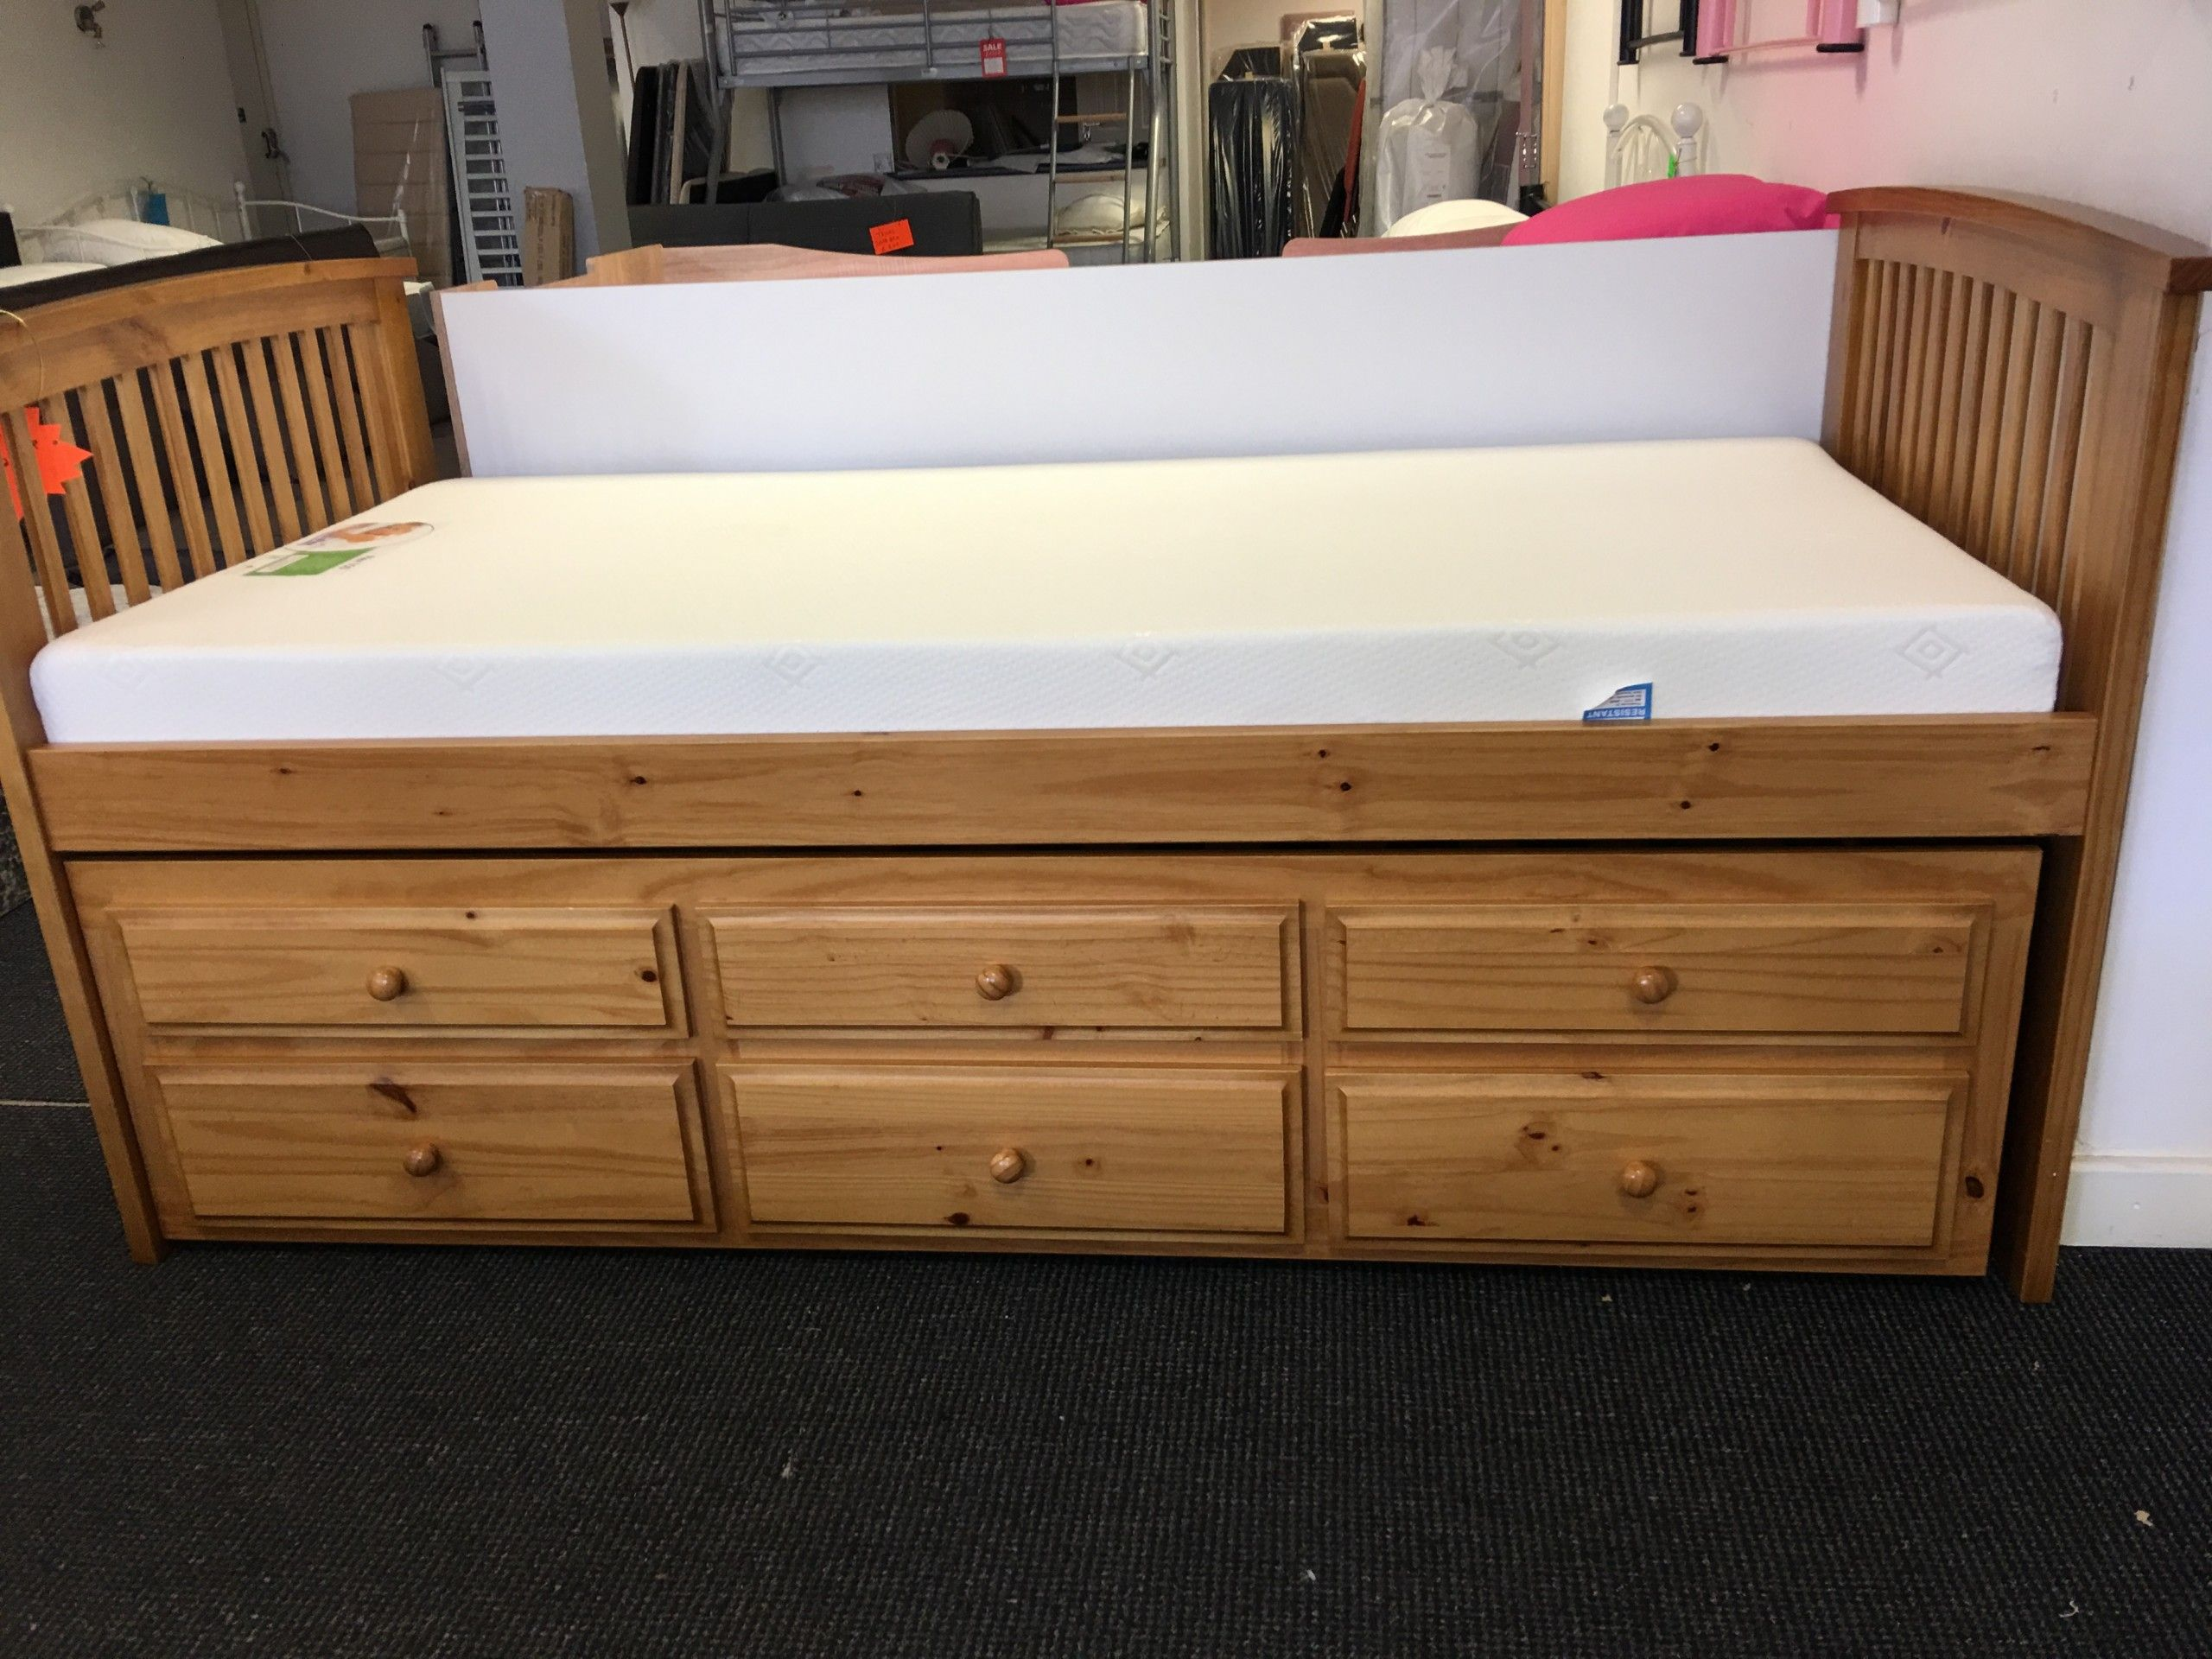 Miraculous Bedroom Furniture Southport Merseyside Download Free Architecture Designs Intelgarnamadebymaigaardcom